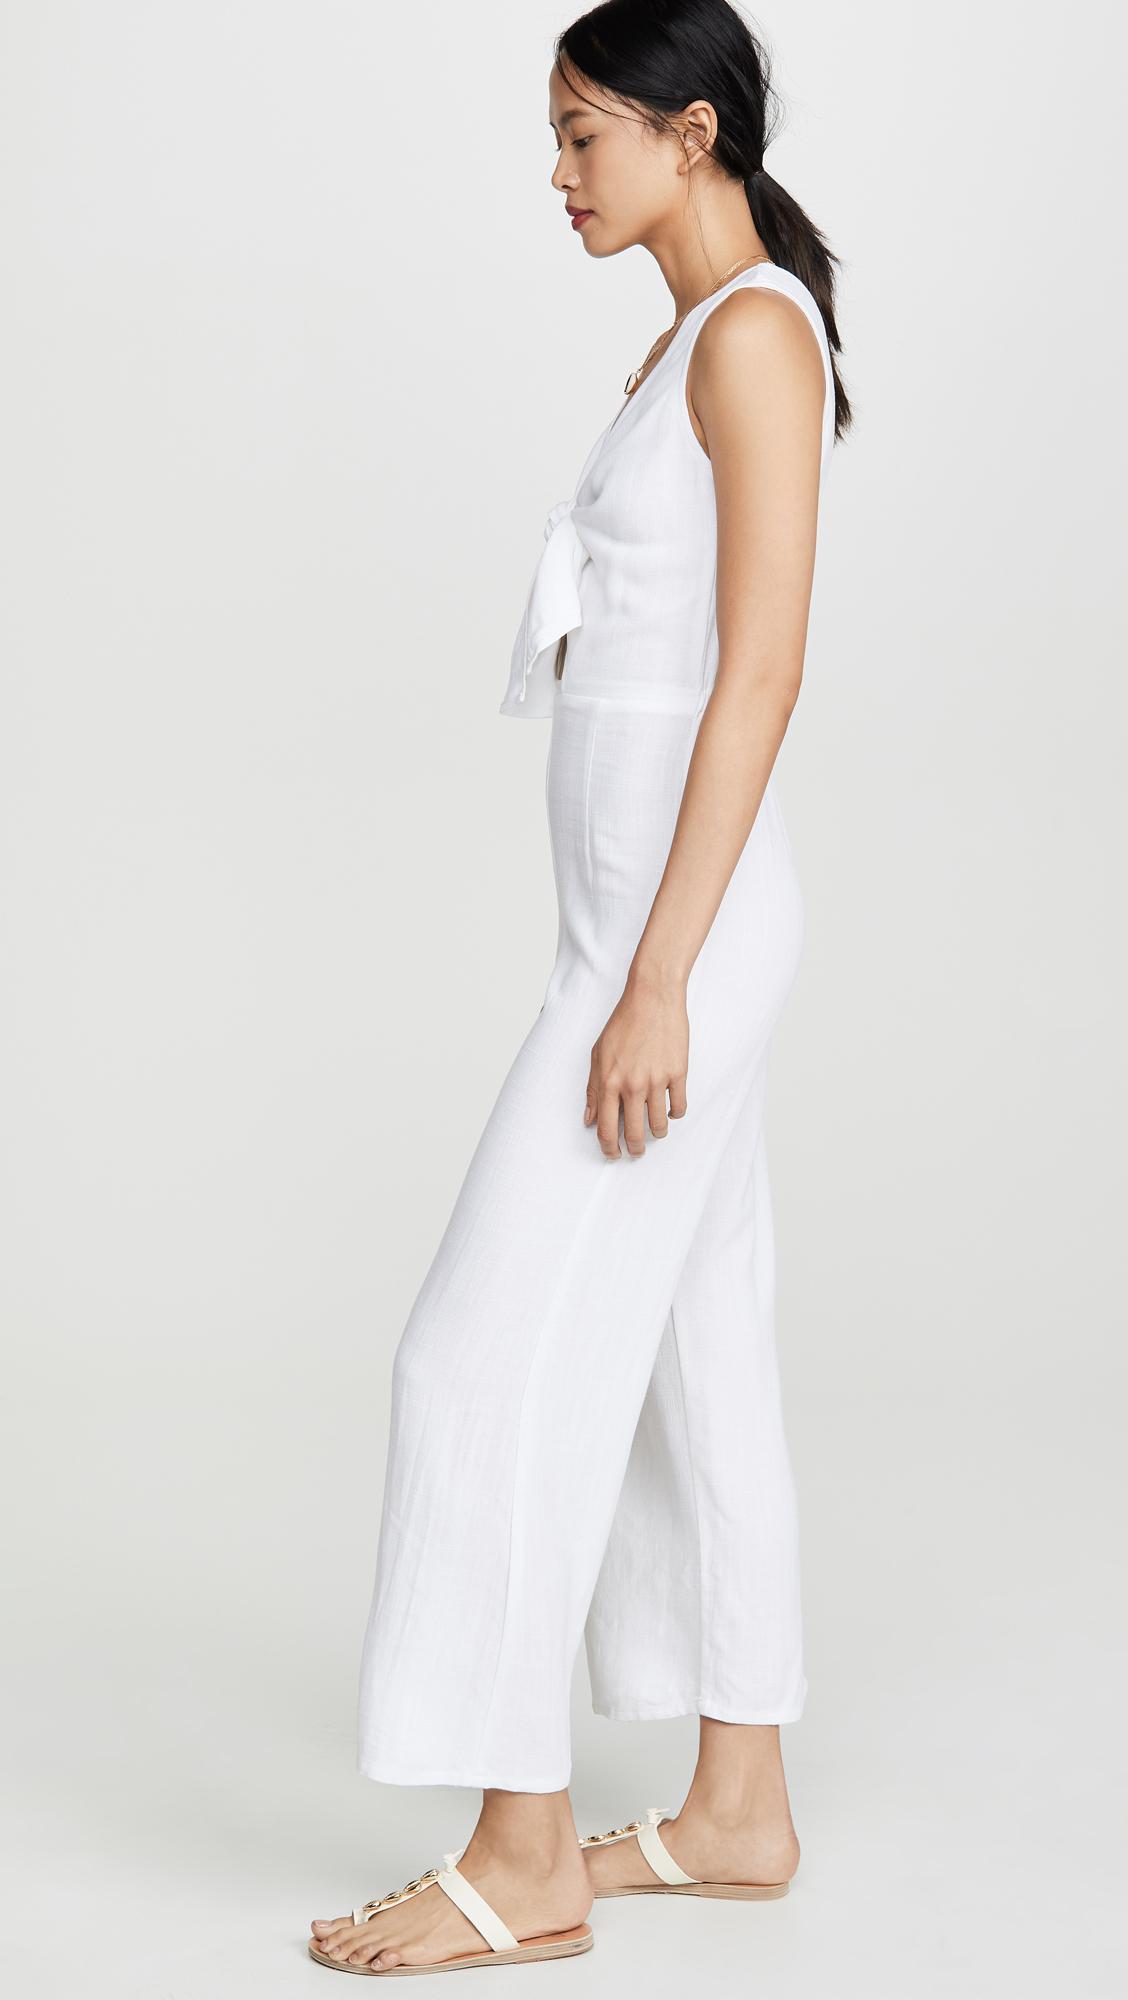 efadc4226d646 Rachel Pally Linen Sleeveless Leon Jumpsuit in White - Lyst